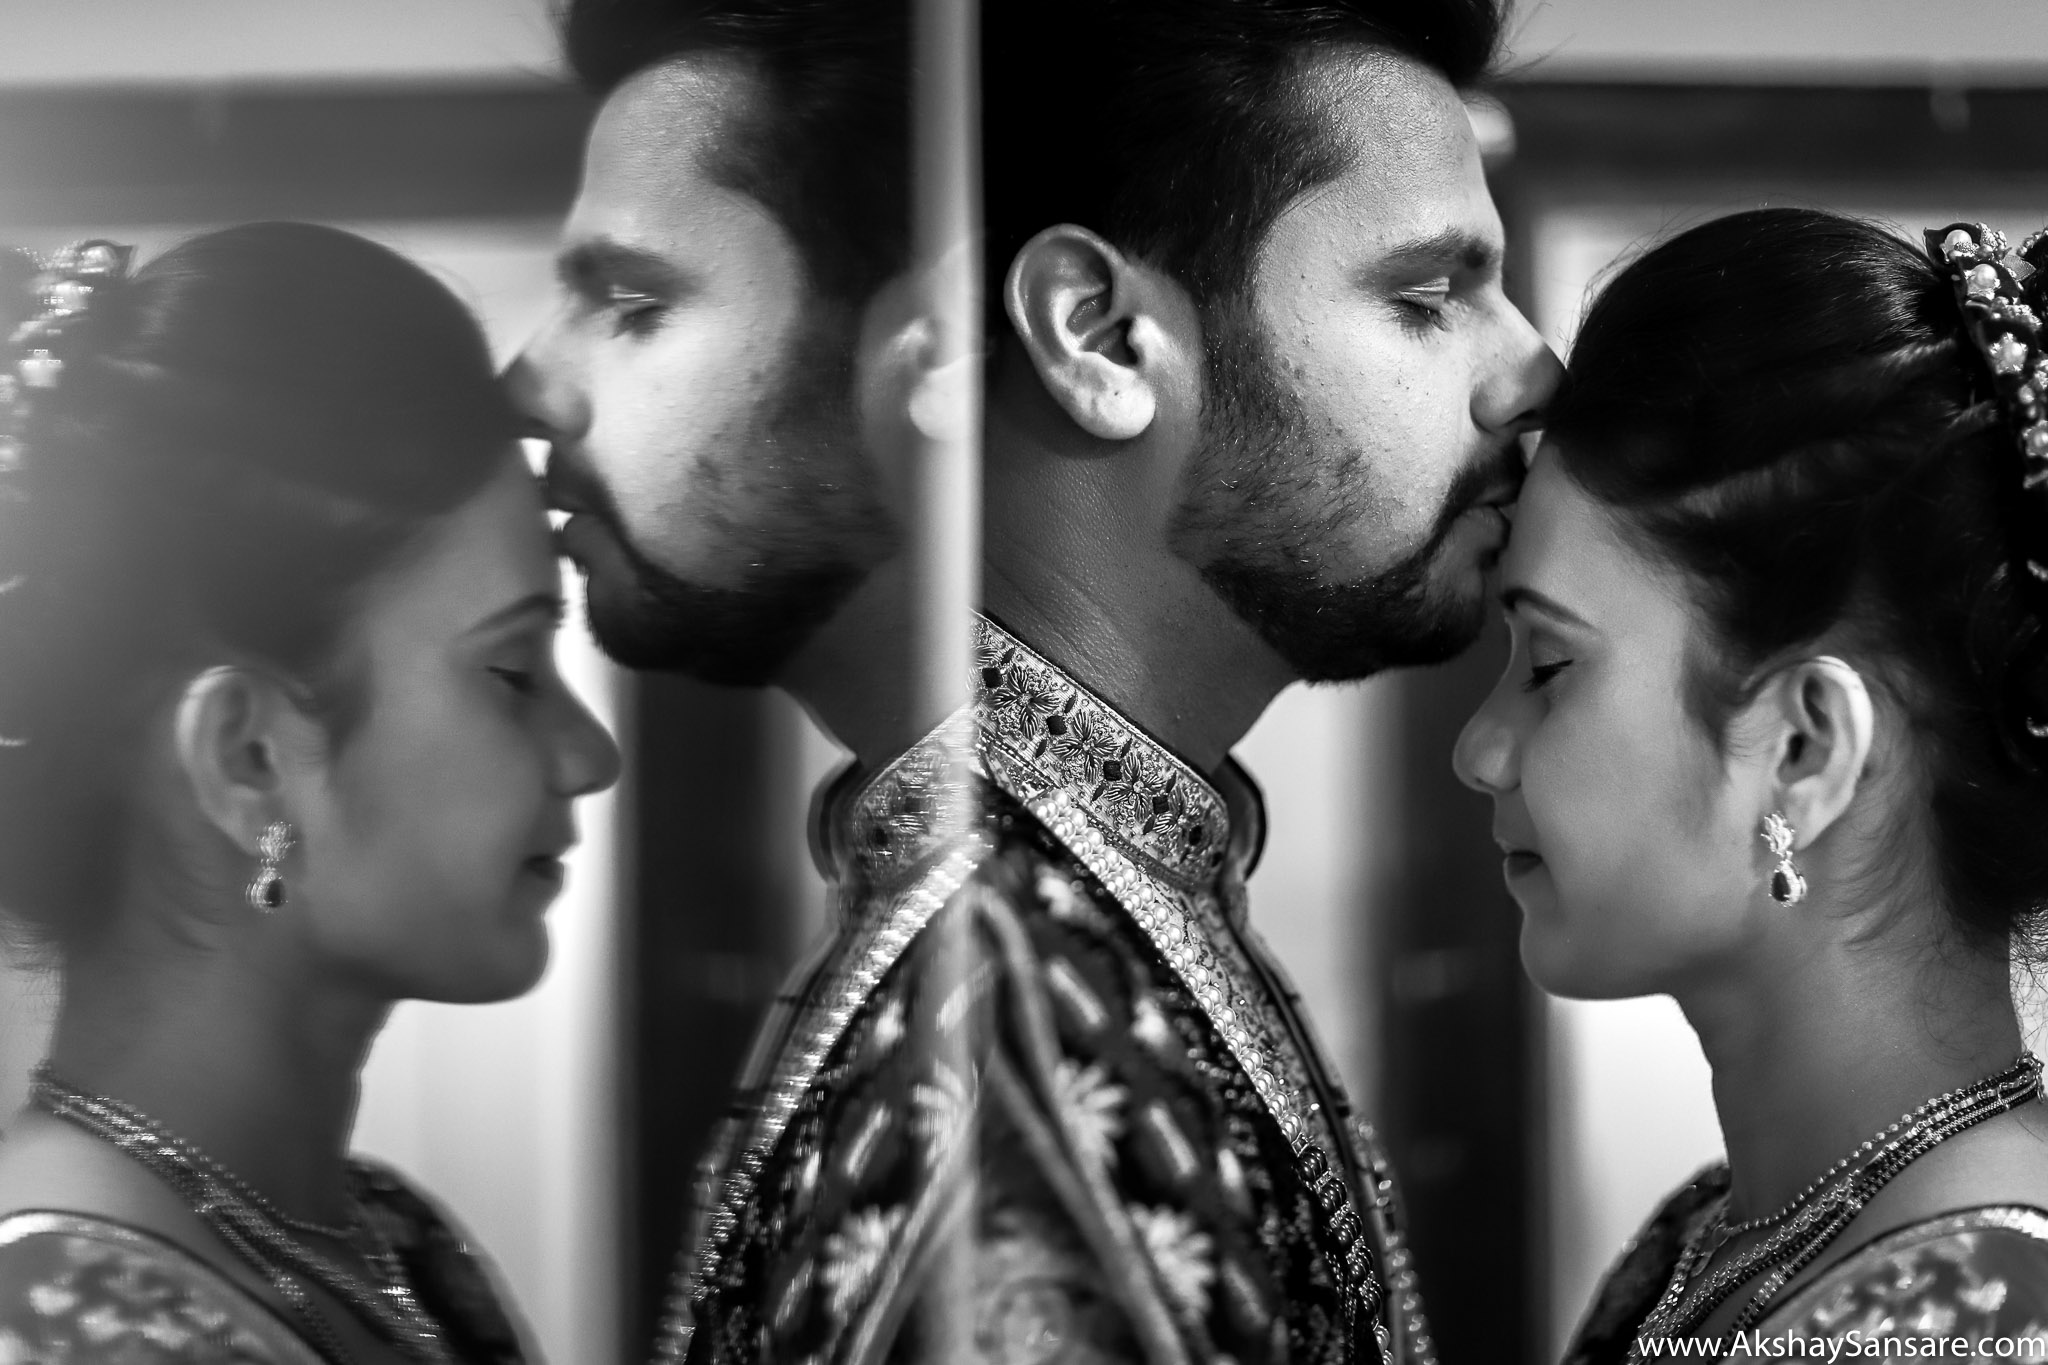 Aditya x Poonam Blog Akshay Sansare Photography Candid Photographer in Mumbai Best Cinematic wedding film filmer-24.jpg